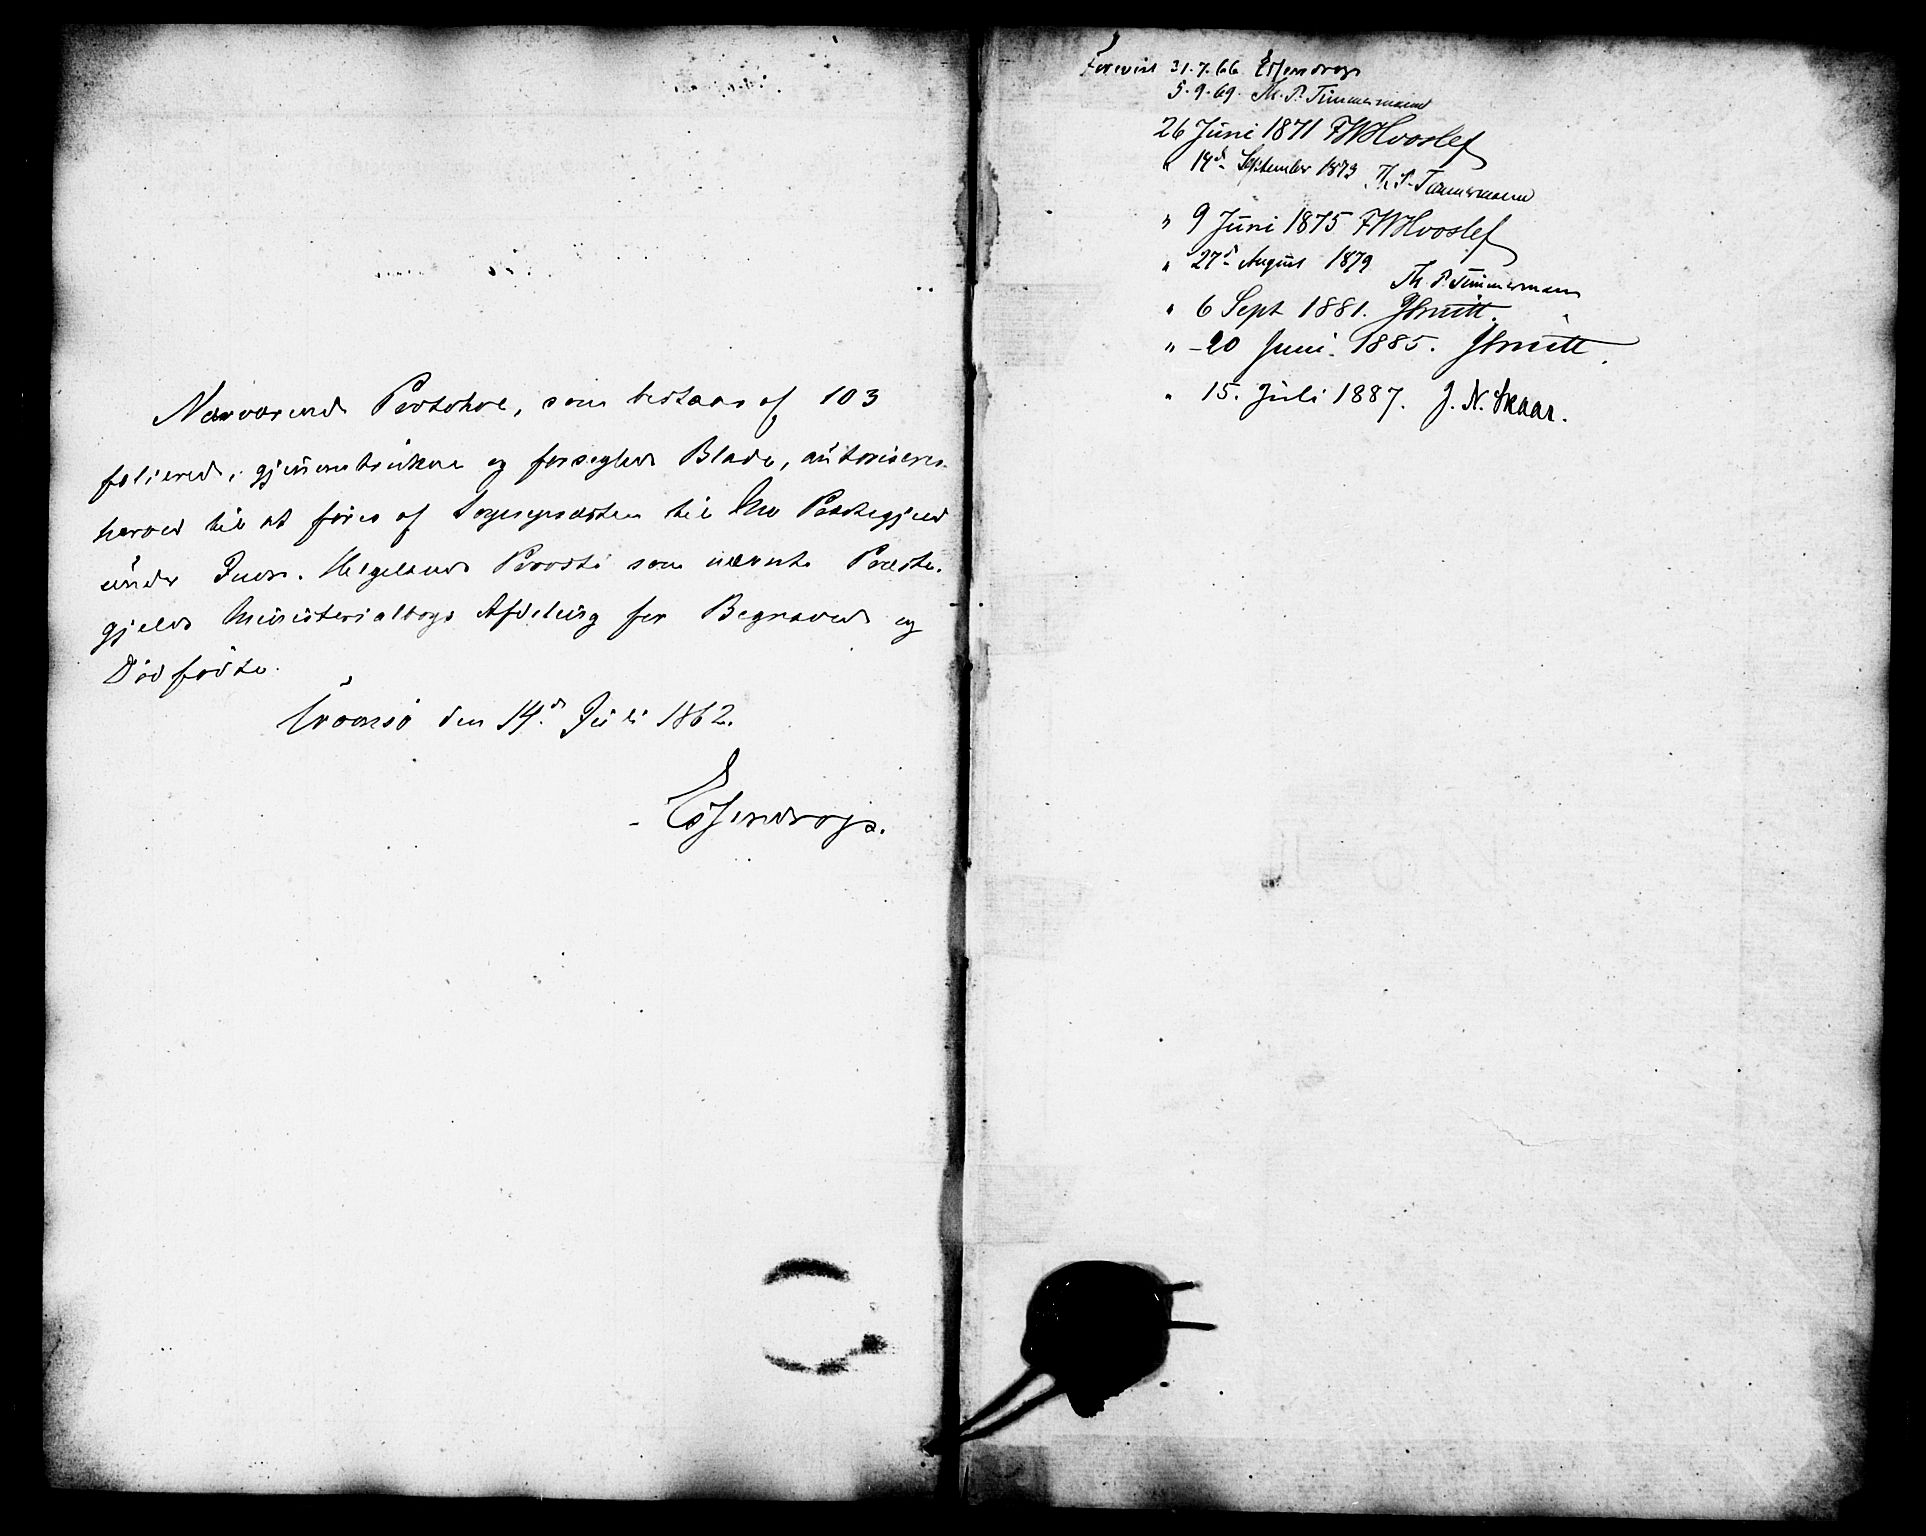 SAT, Ministerialprotokoller, klokkerbøker og fødselsregistre - Nordland, 827/L0396: Ministerialbok nr. 827A08, 1864-1886